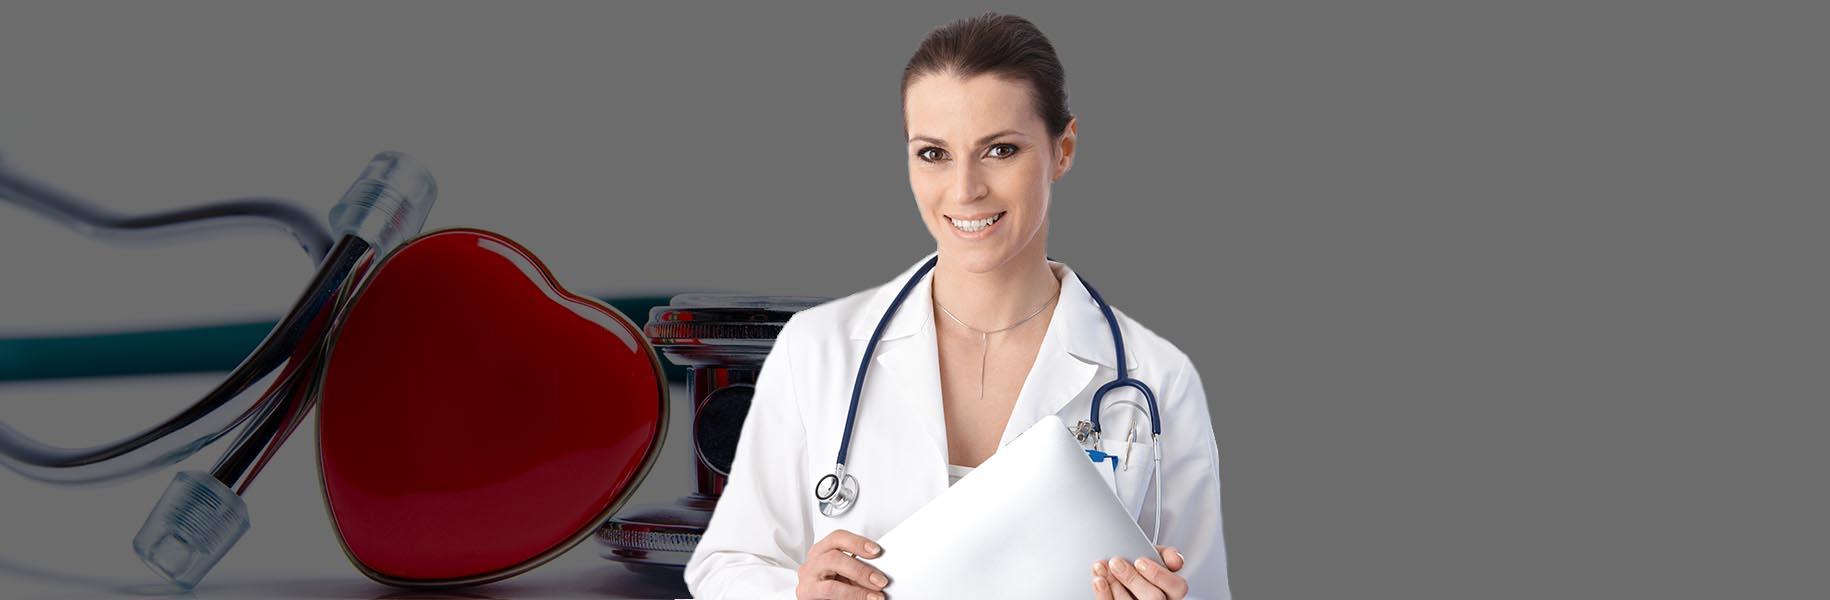 doctor-stethescope